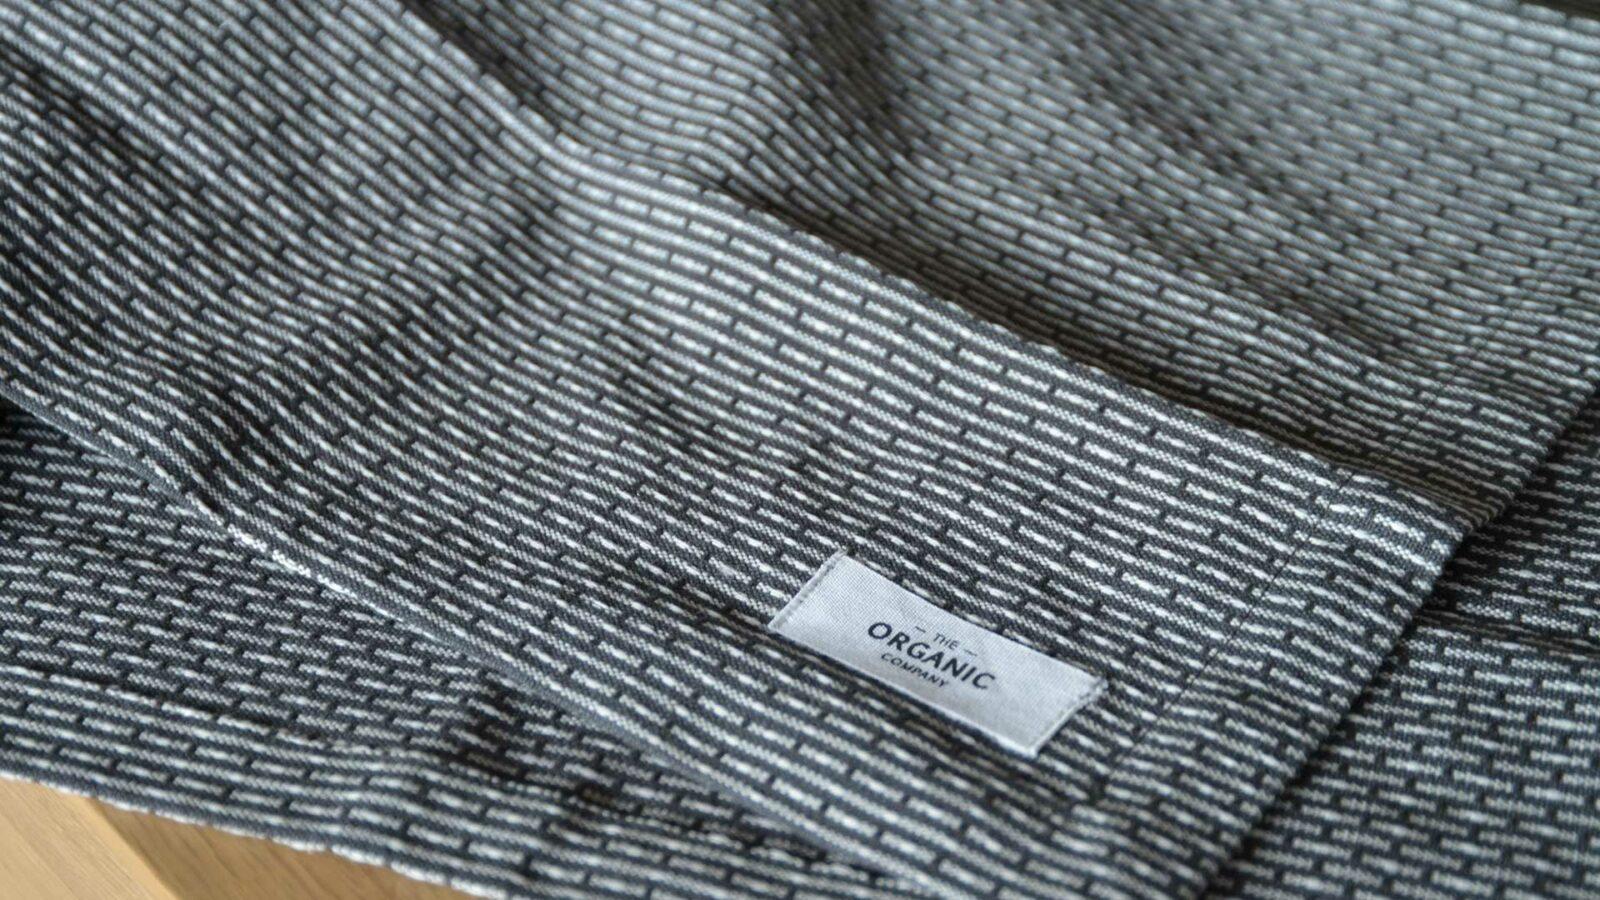 certified organic cotton towels modern monochrome weave pattern dark grey and white